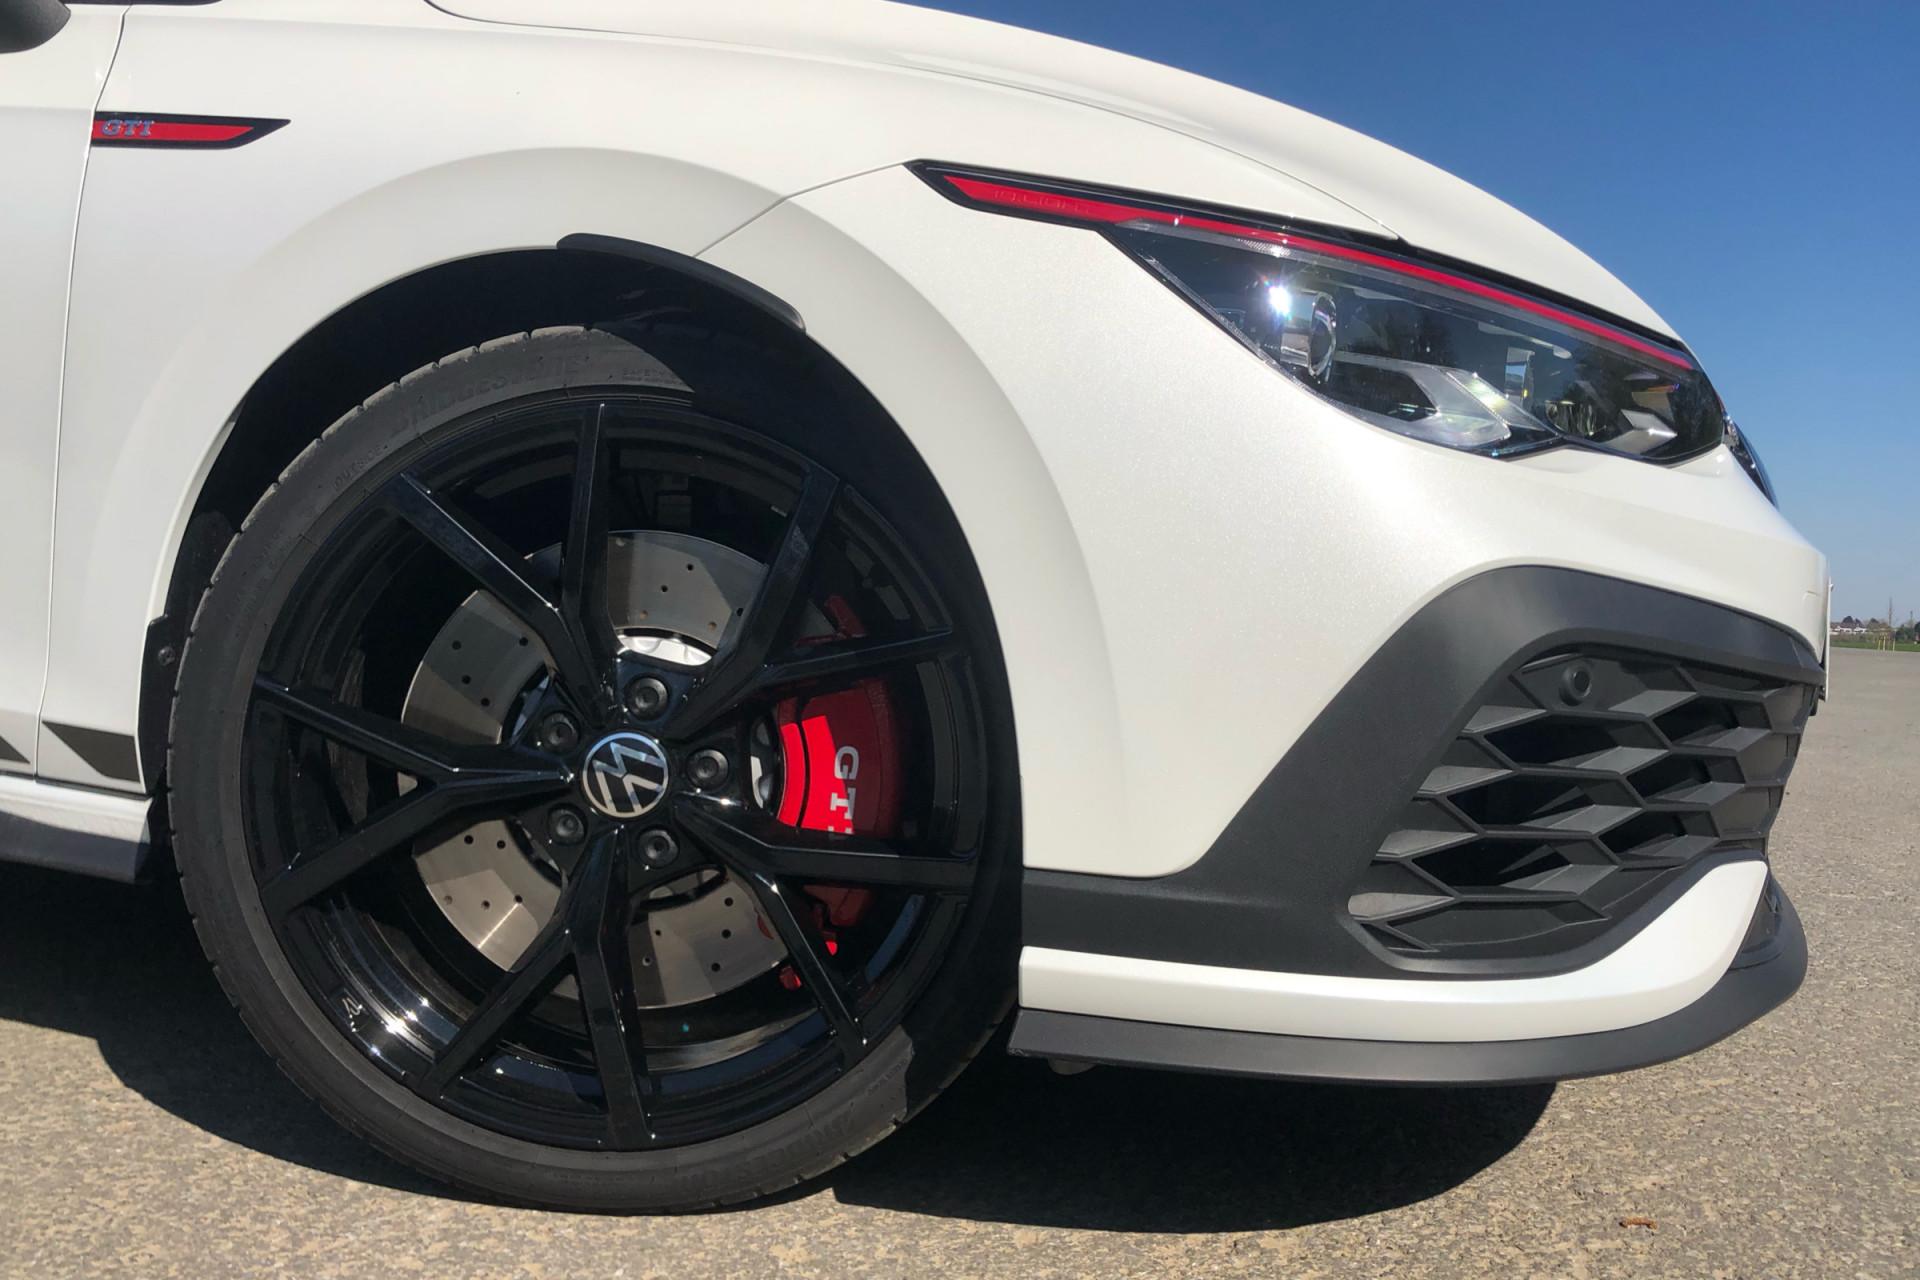 Essai 2021 VW Golf GTI Clubsport - Test Moniteur Automobile